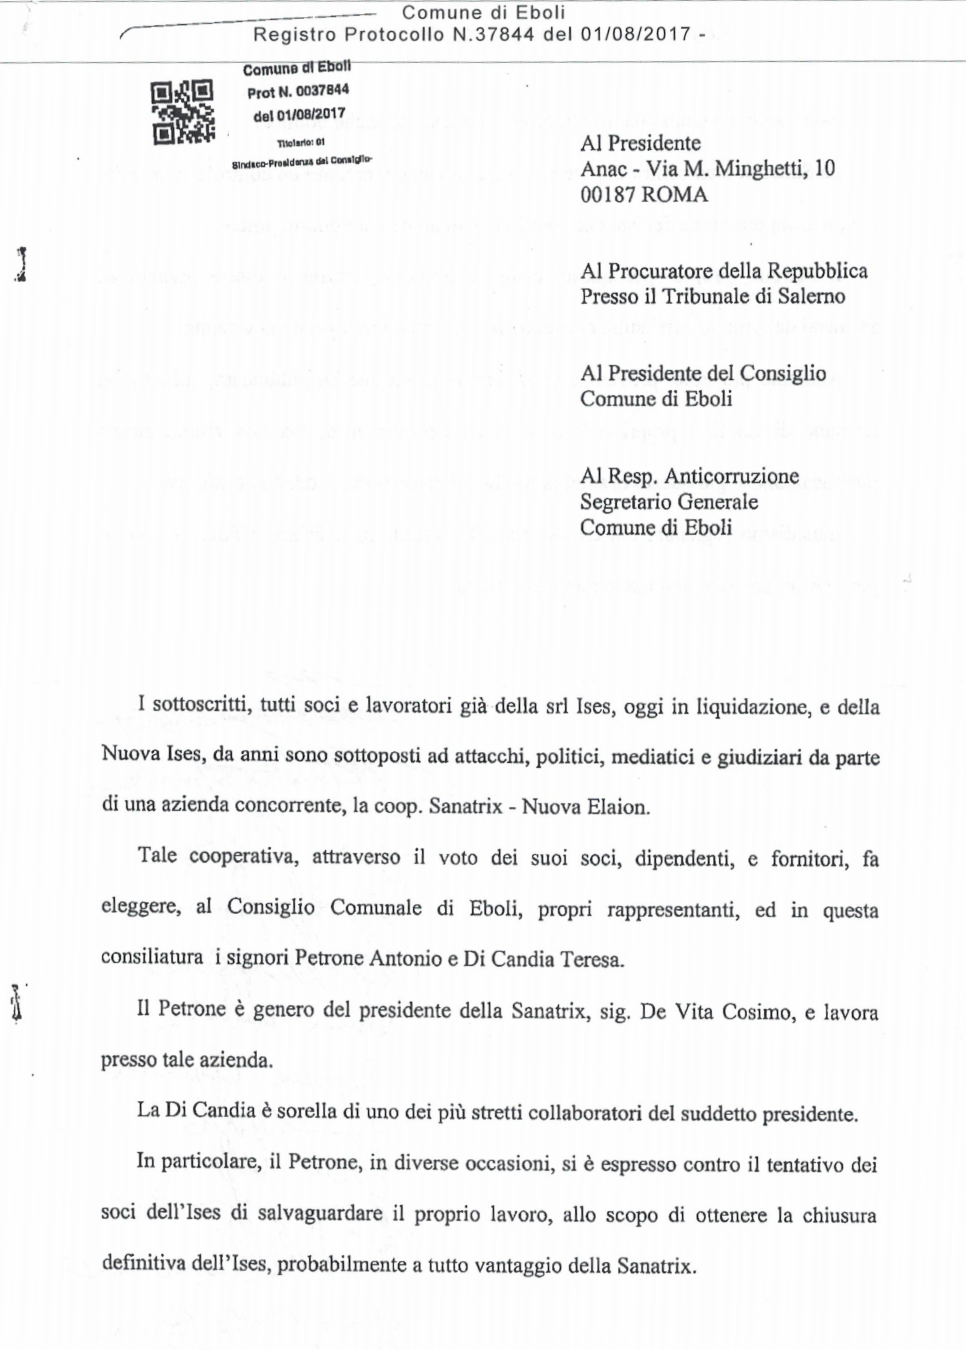 Lettera ANAC1